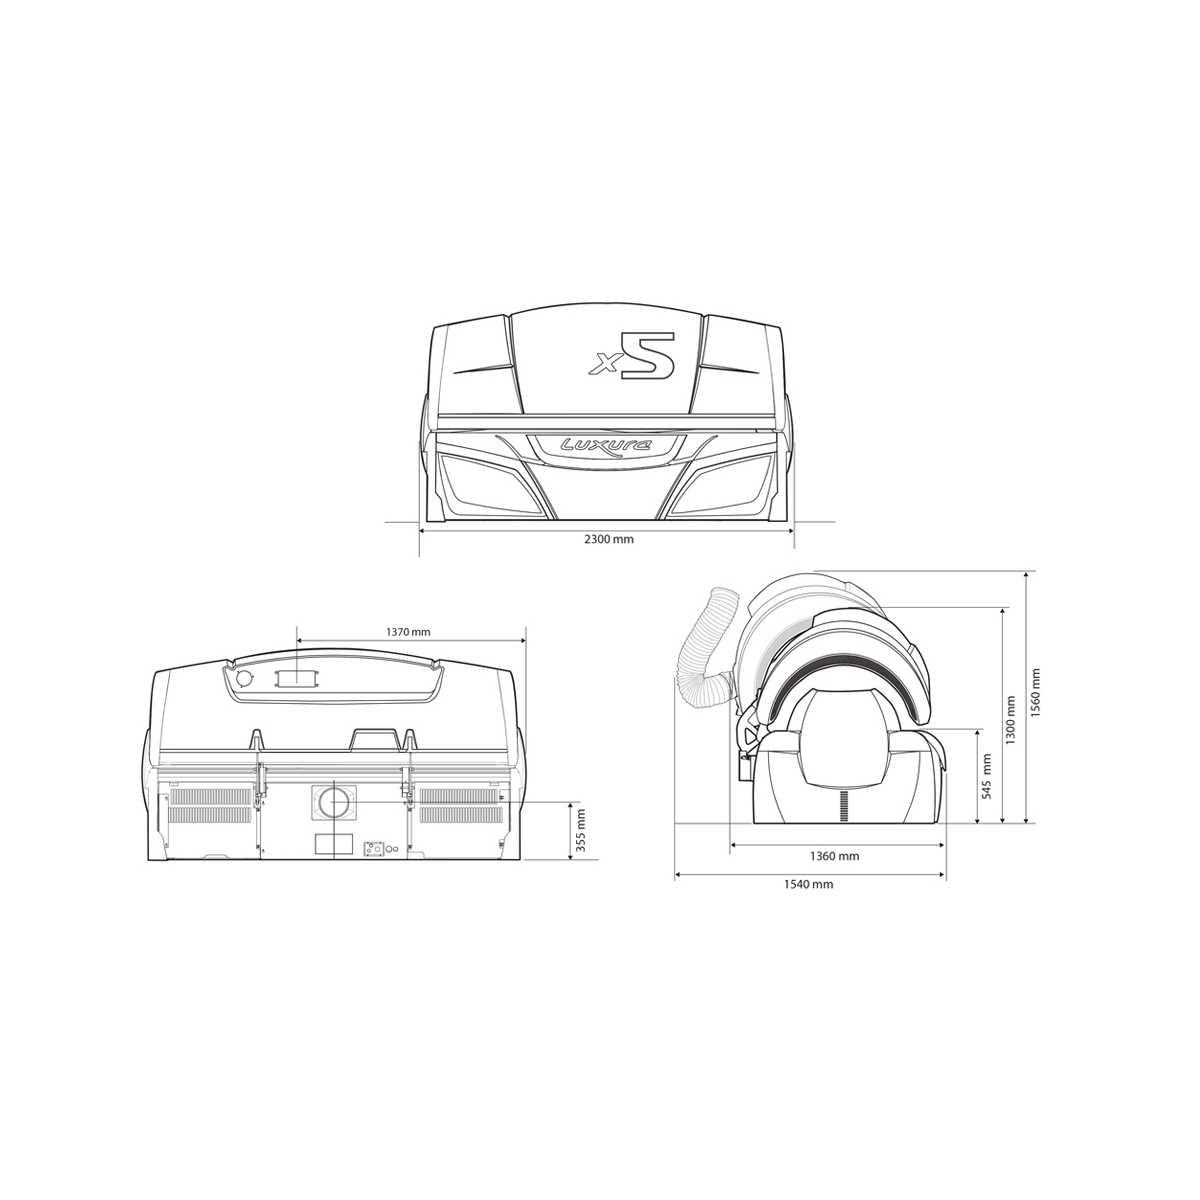 Hapro Luxura X5 34 SLI - Lettini Abbronzanti Luxura - Luxura